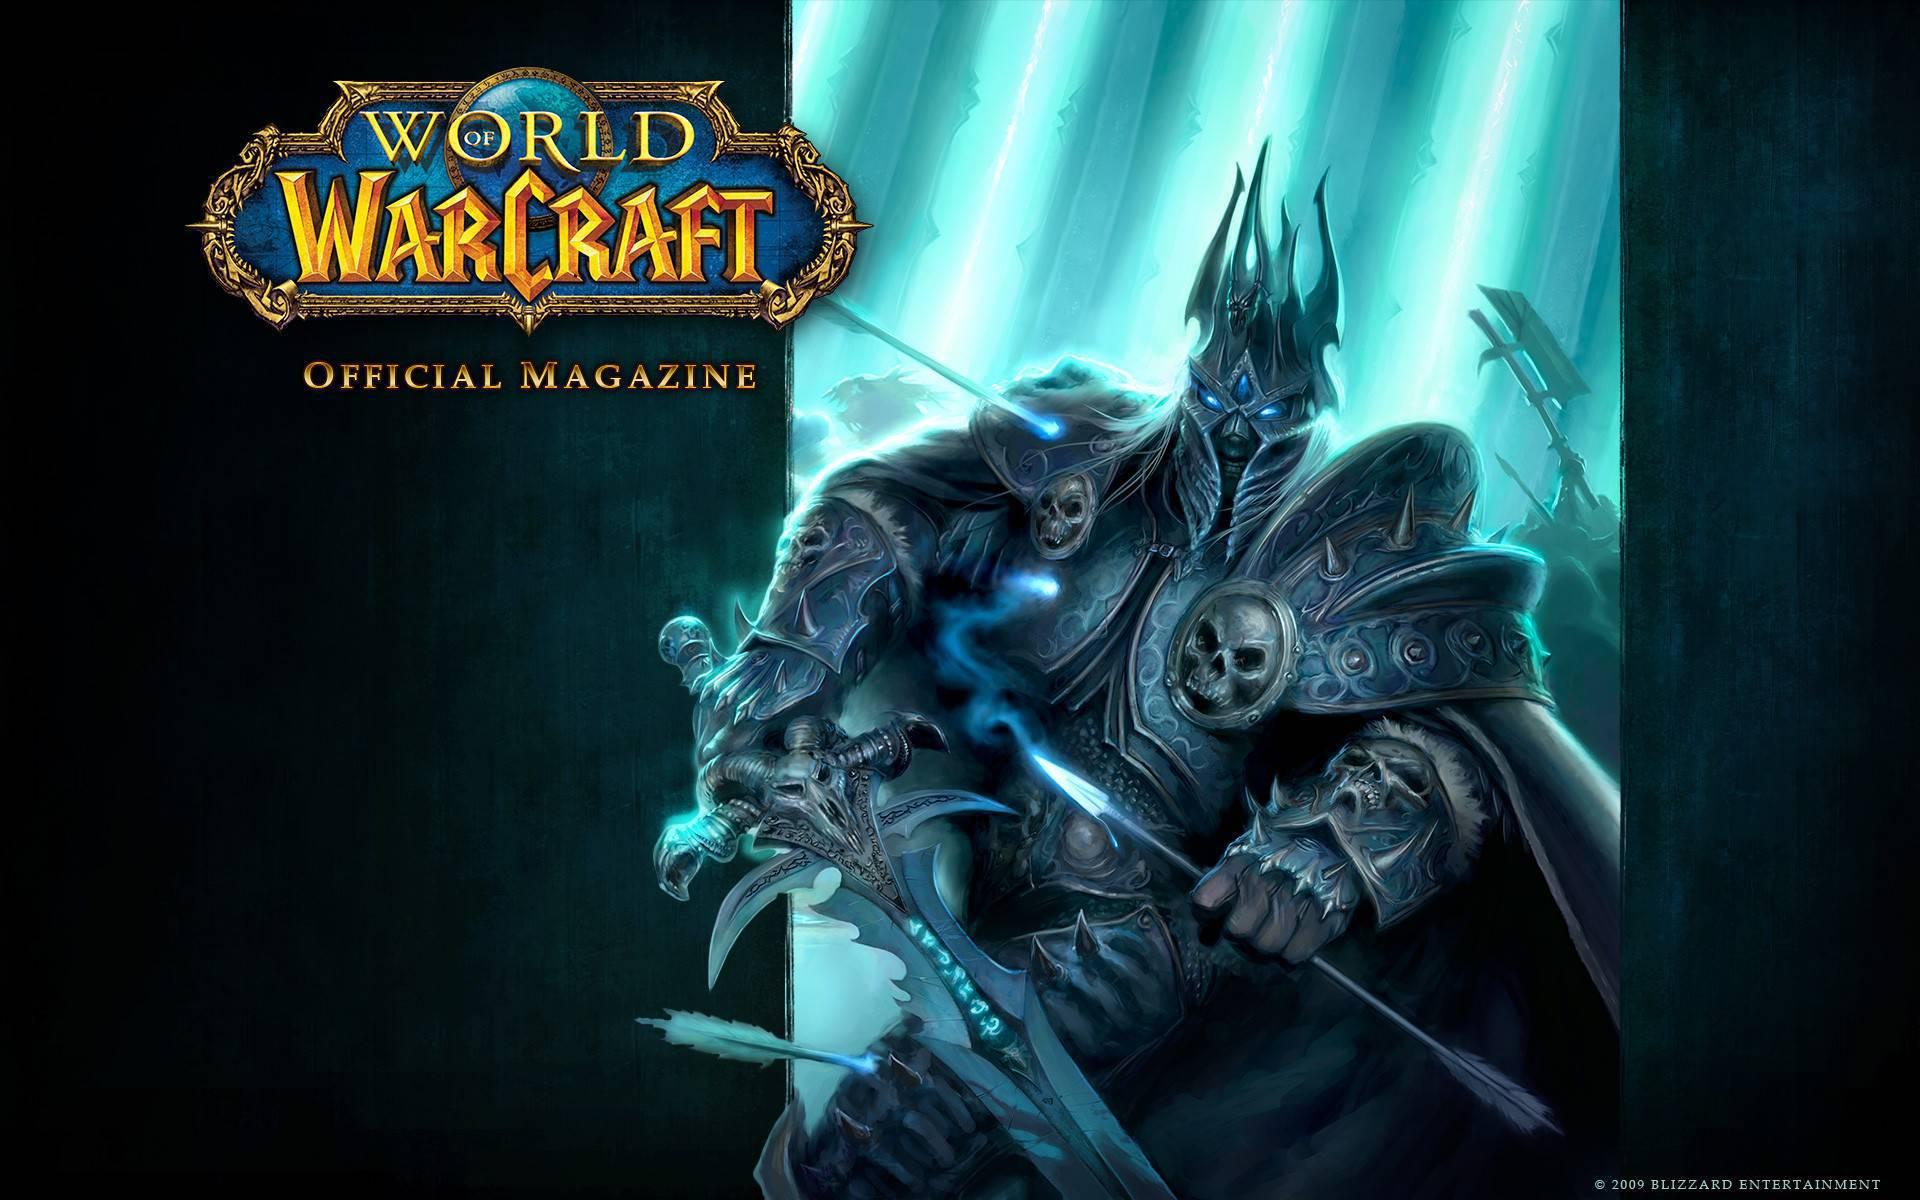 Fondos De Pantalla Wallpapers Gratis World Of Warcraft